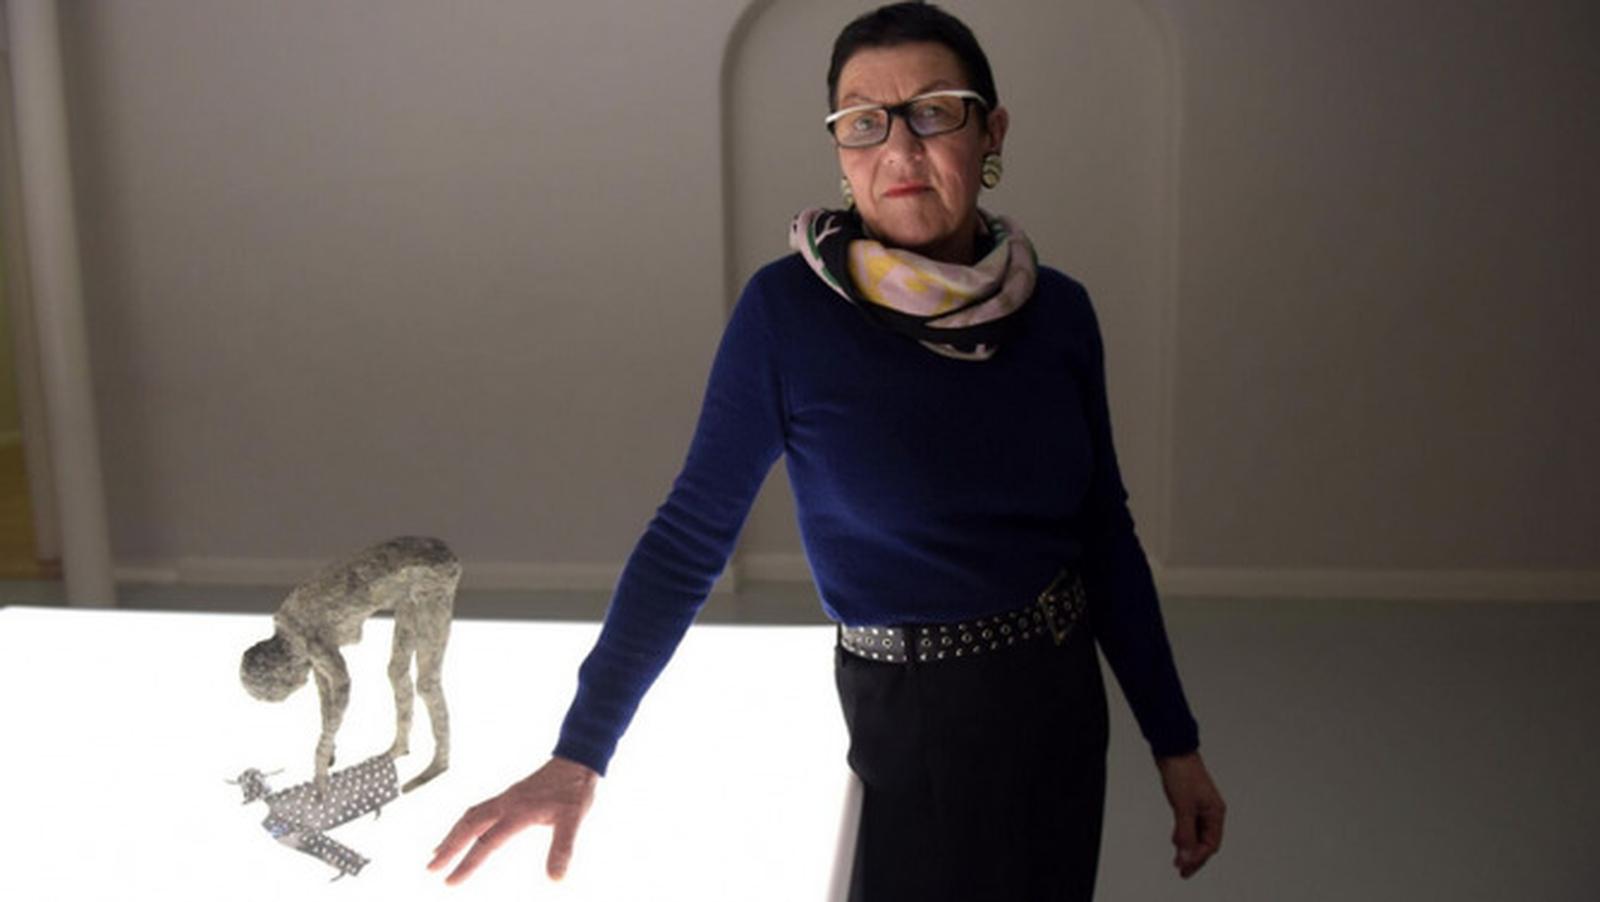 Death announced of artist Janet Mullarney